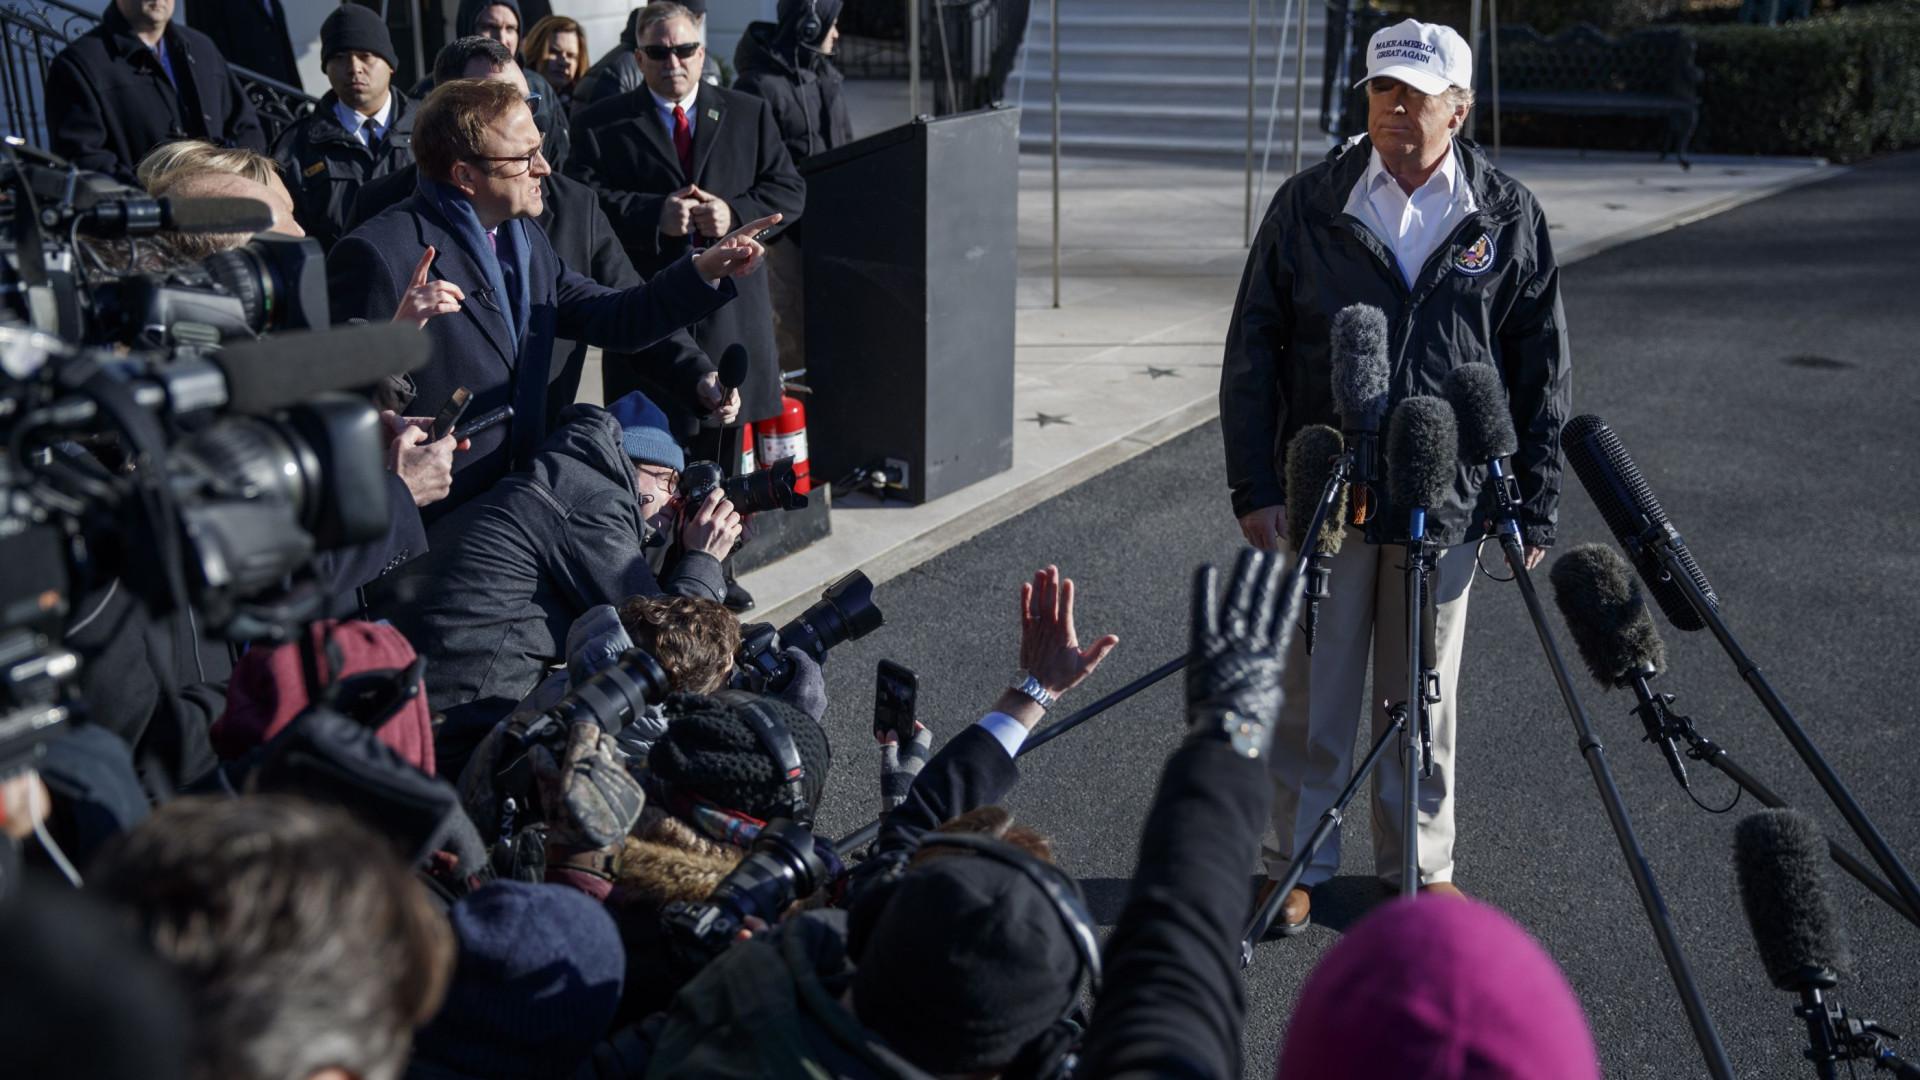 Trump admite que pode declarar emergência nacional para construir muro